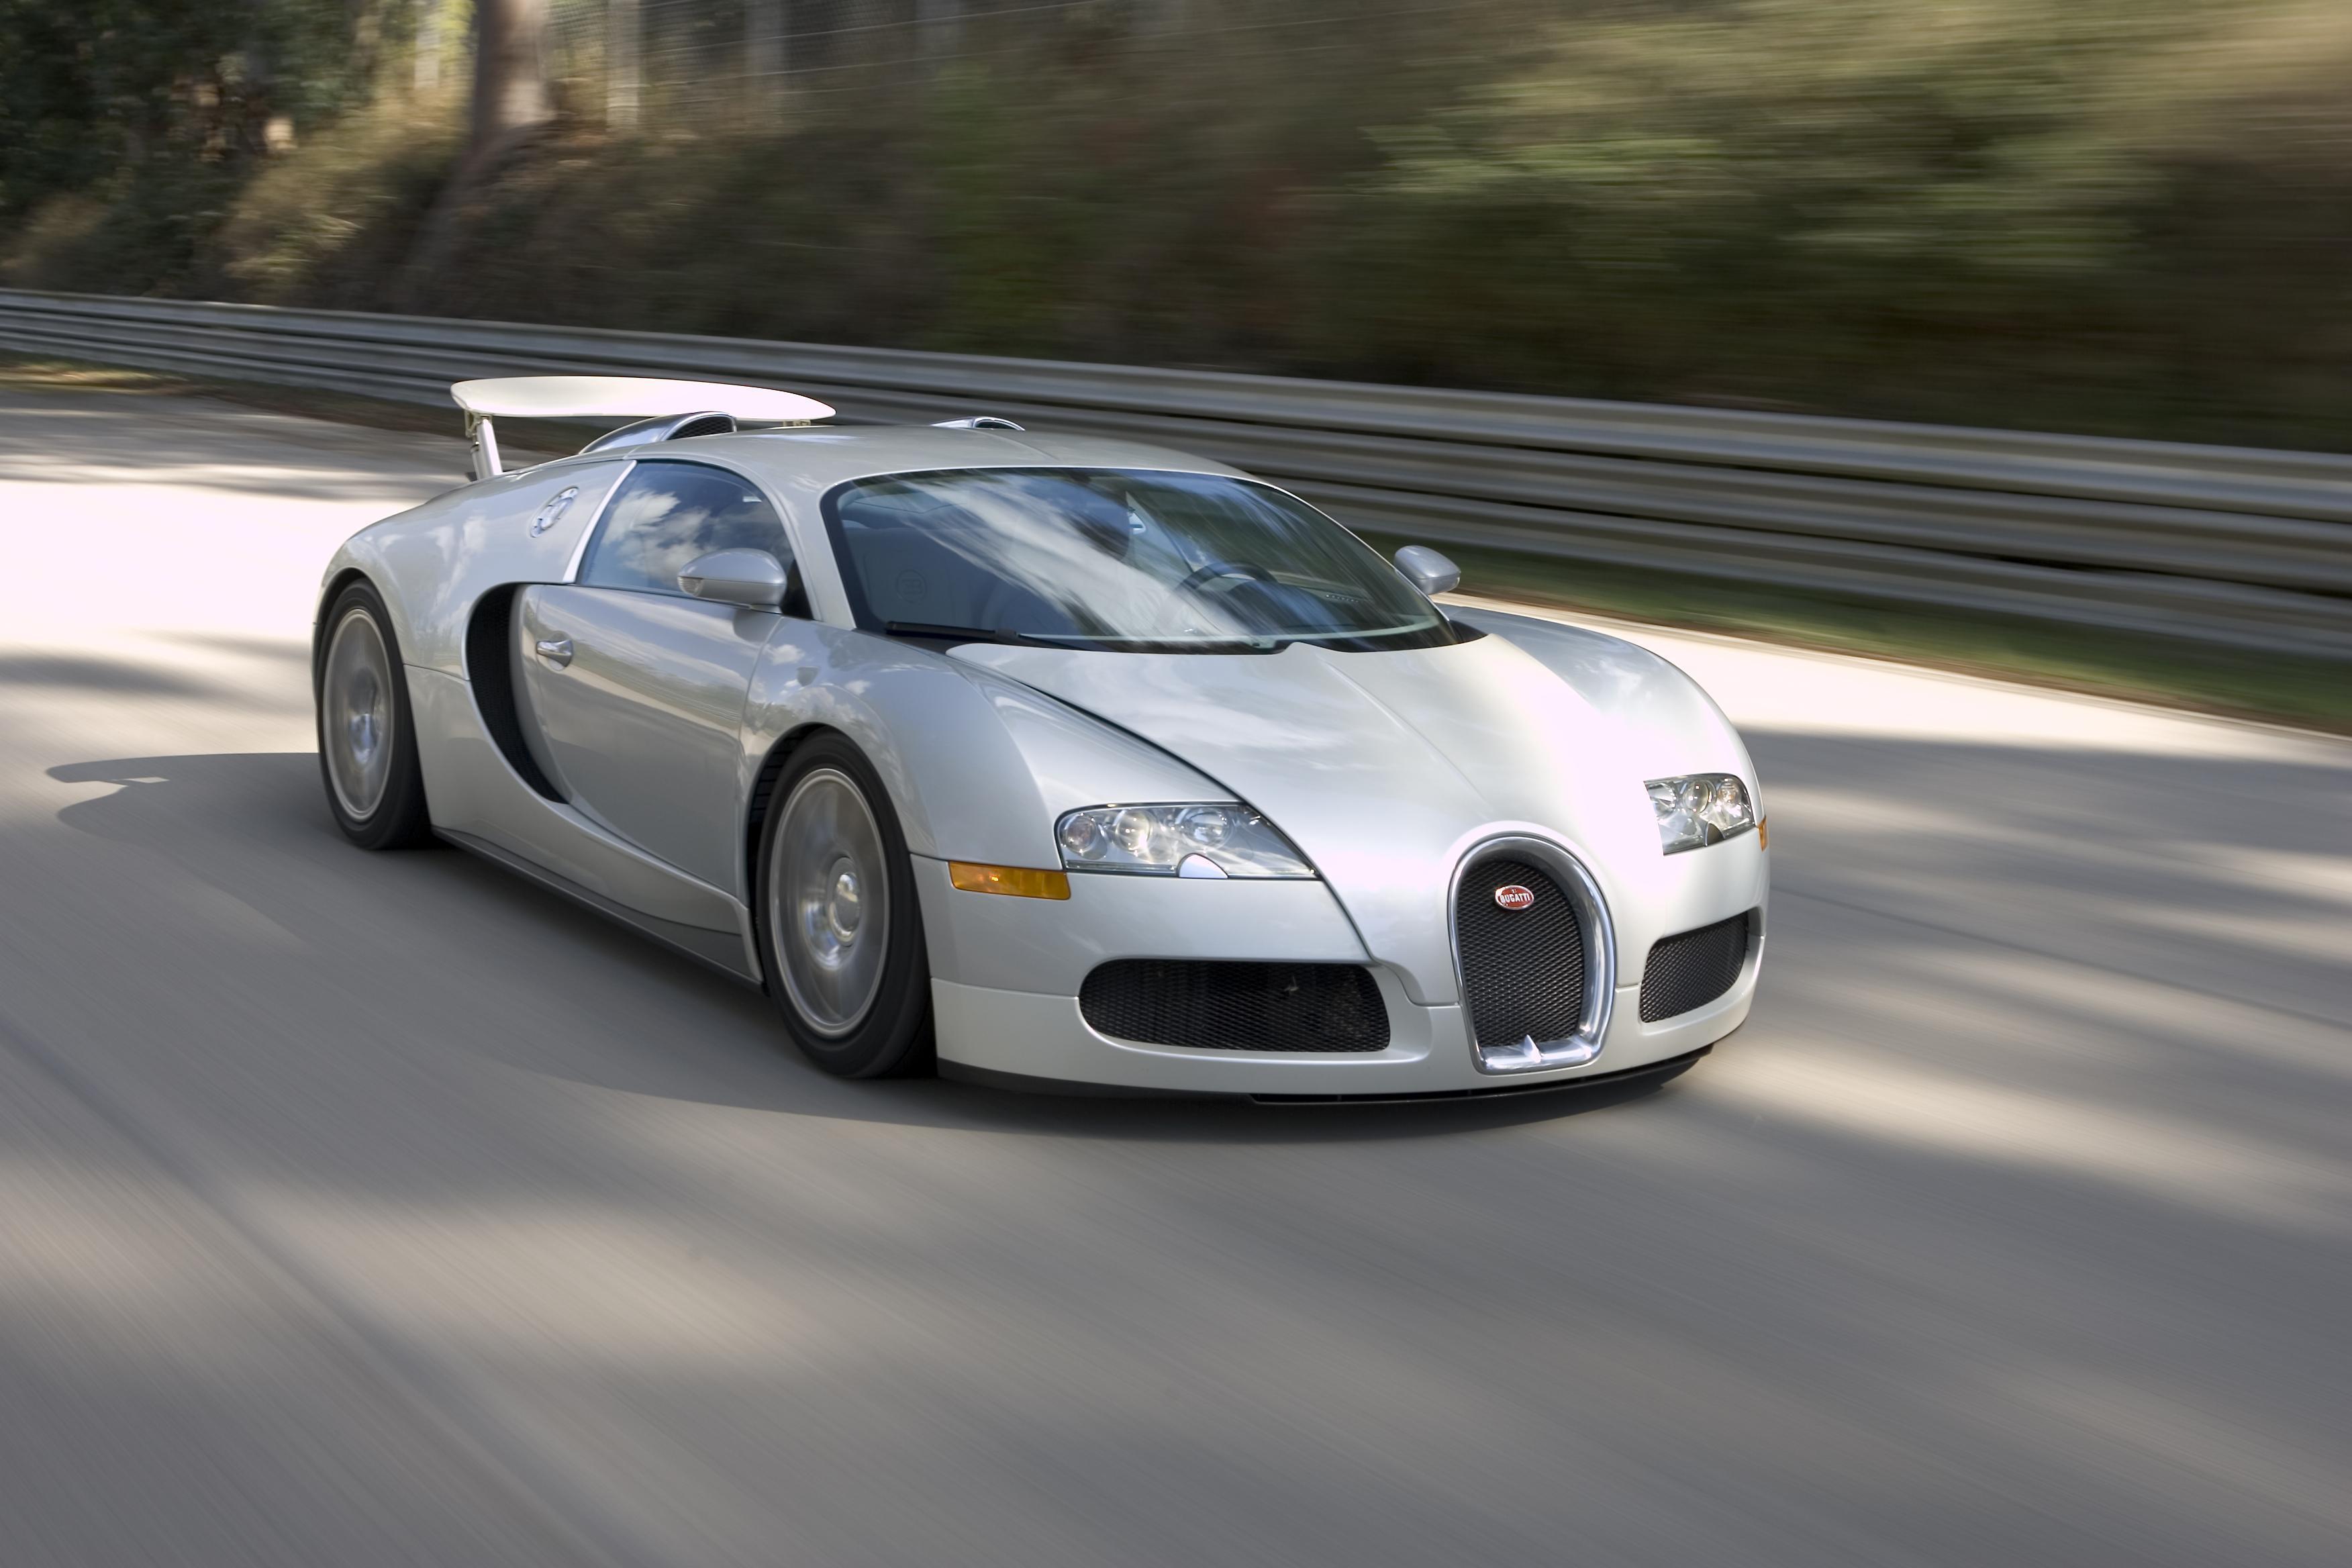 S0-Les-10-informations-les-plus-etonnantes-sur-la-Bugatti-Veyron-27783 Remarkable Bugatti Veyron Grand Sport Vitesse Informacion Cars Trend